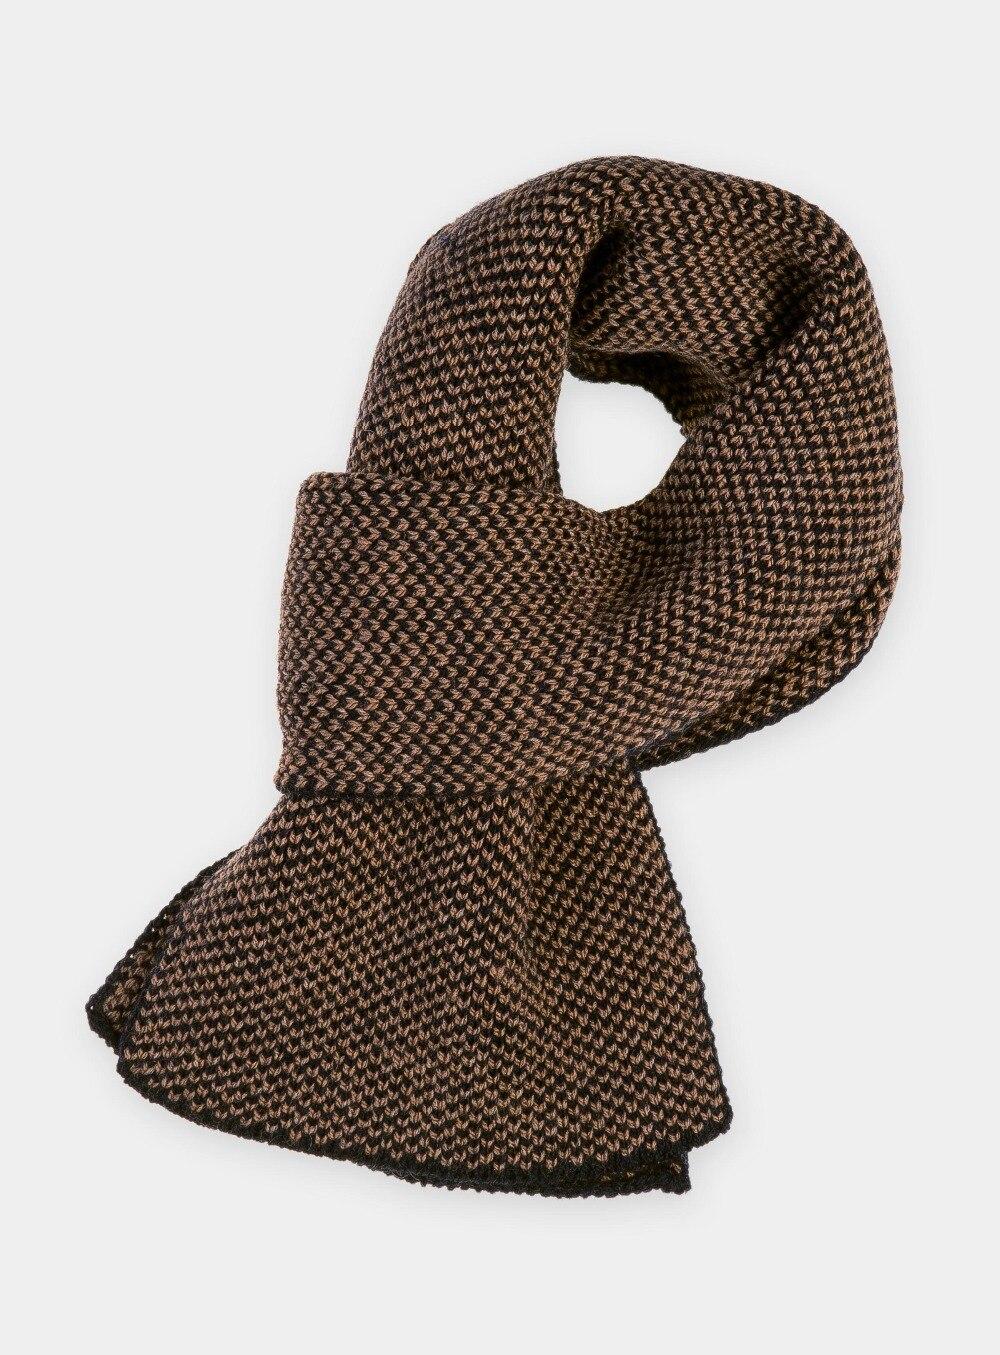 Scarf Canoe 3449118 BRUNA vertical stripe pattern fringed edge scarf